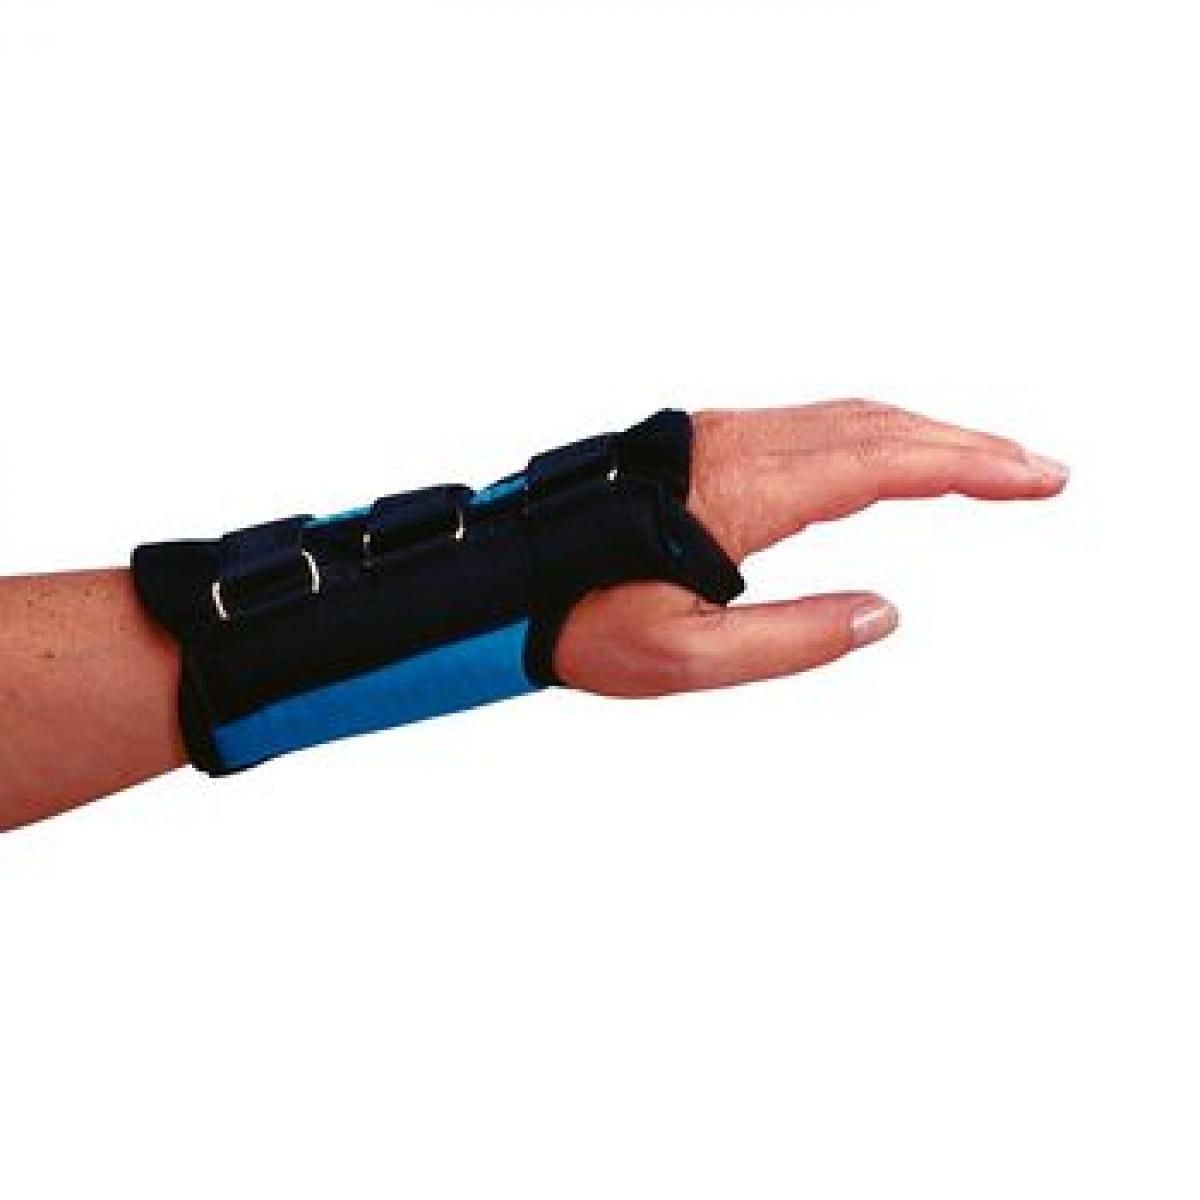 Rolyan Teal D-Ring Wrist Brace